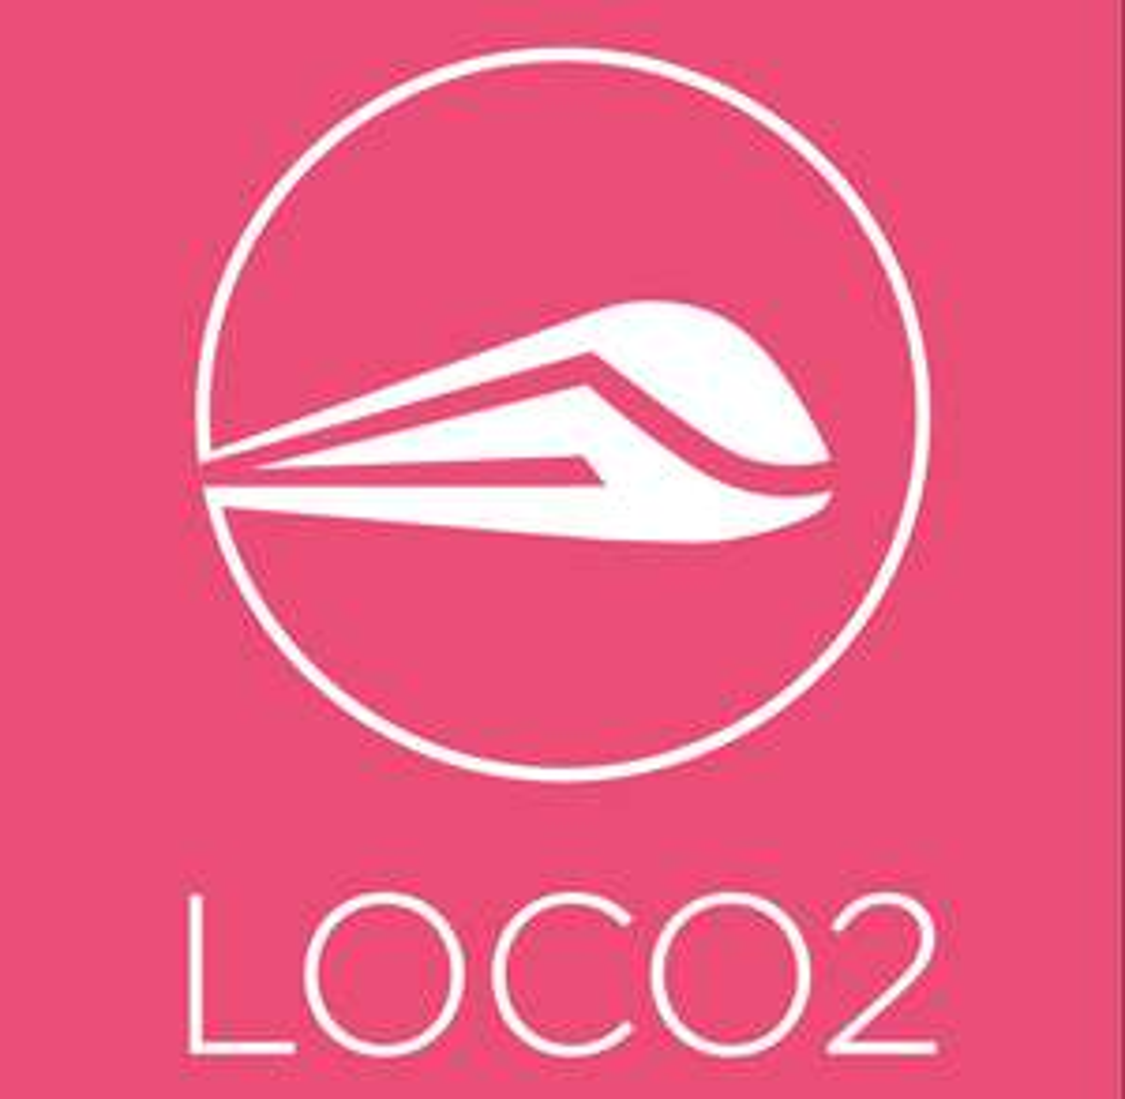 Loco2 £15 off via TopCashback for new members.